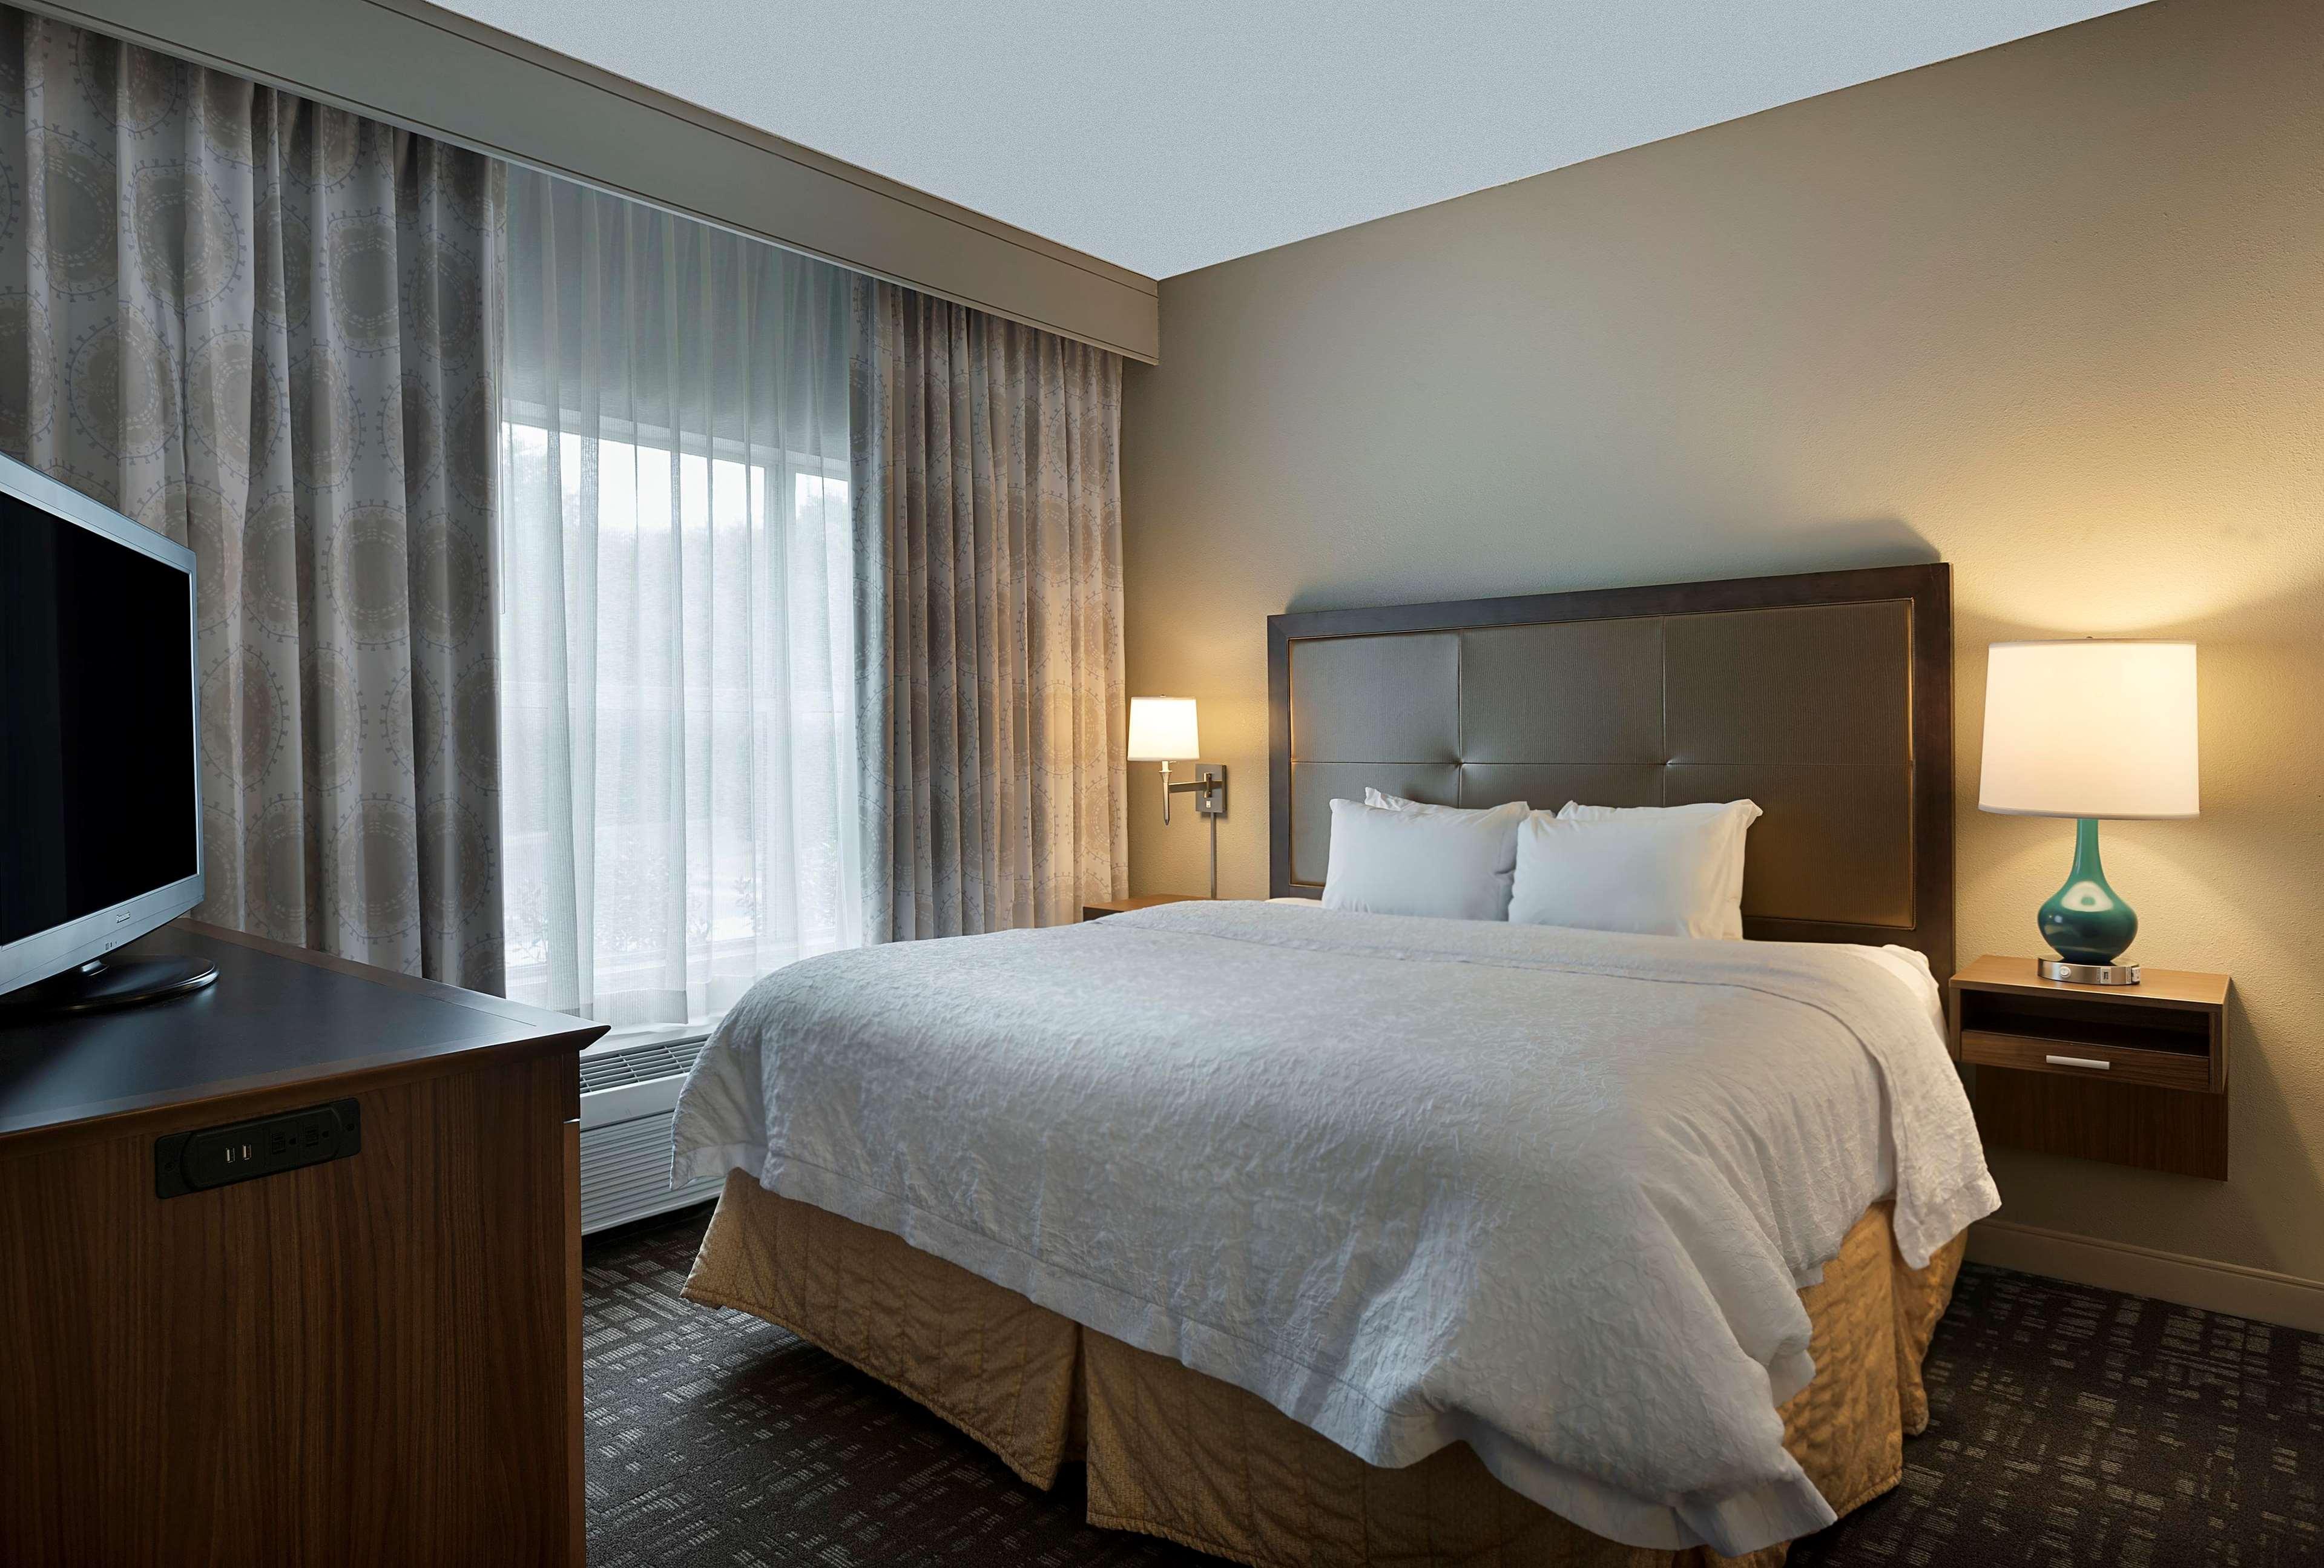 Hampton Inn & Suites Charlotte/Pineville image 20